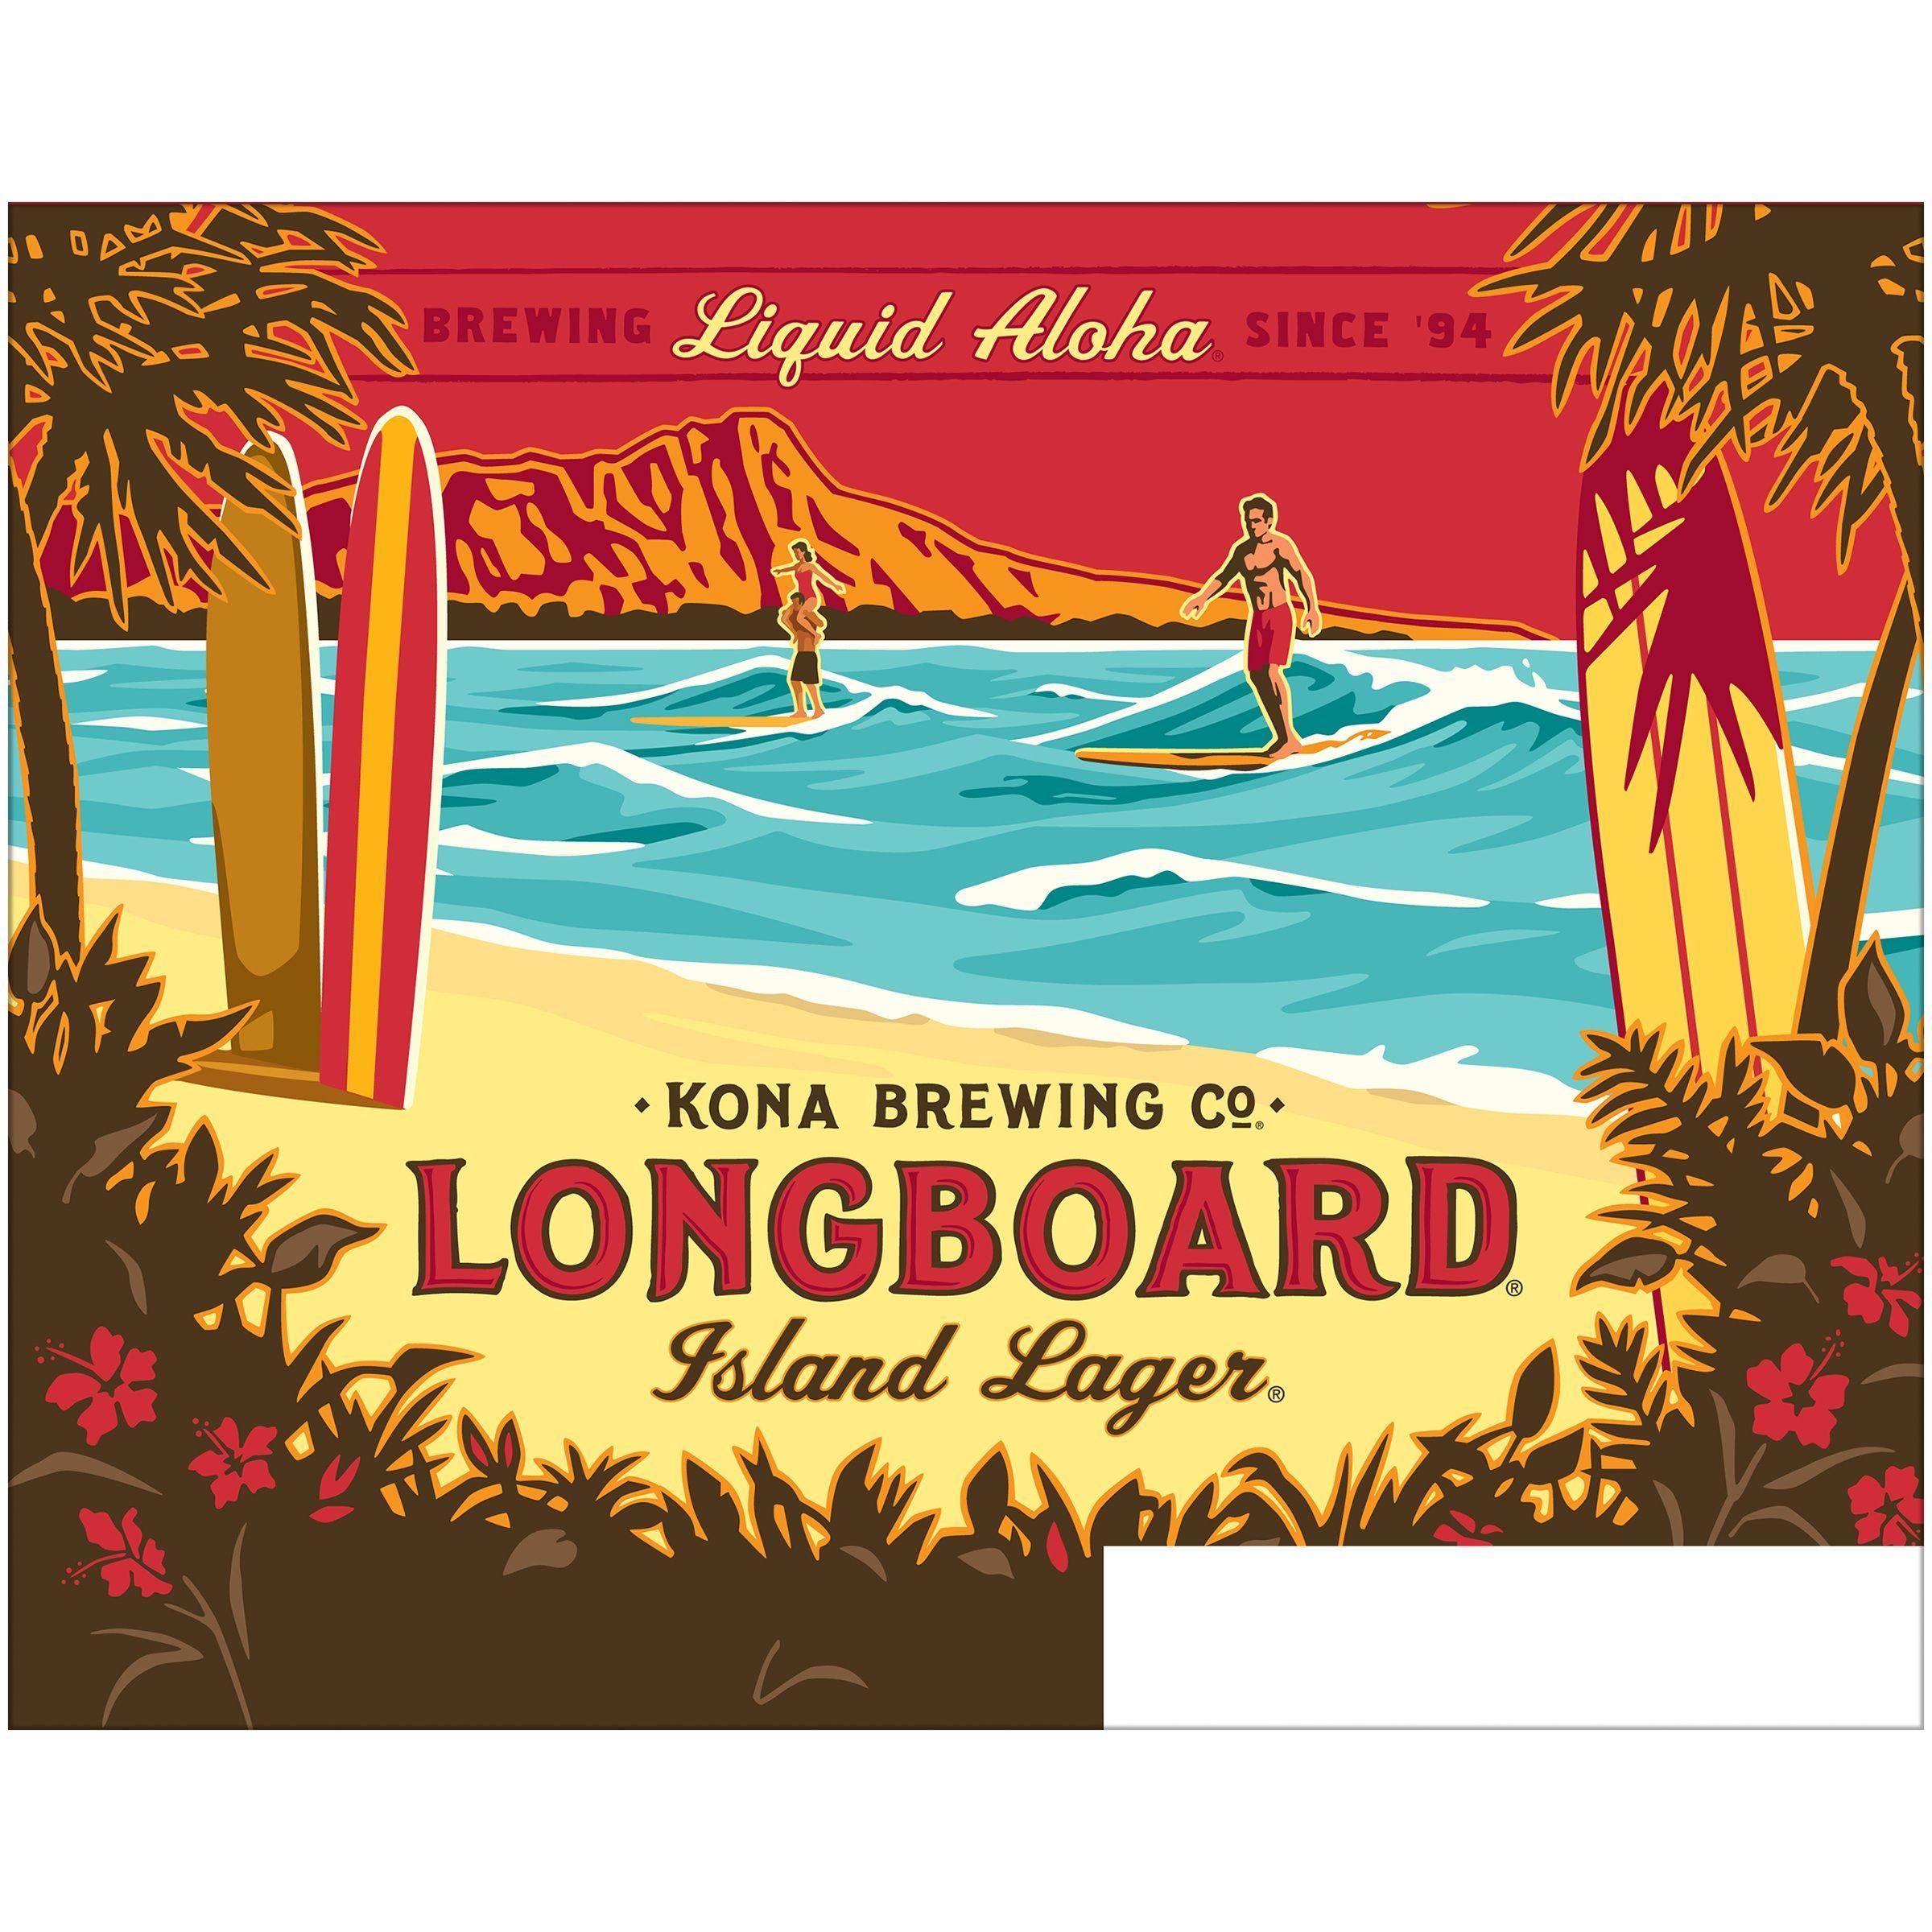 buy kona longboard lager 12 pk 12 fl oz bottles at walmart com rh pinterest com